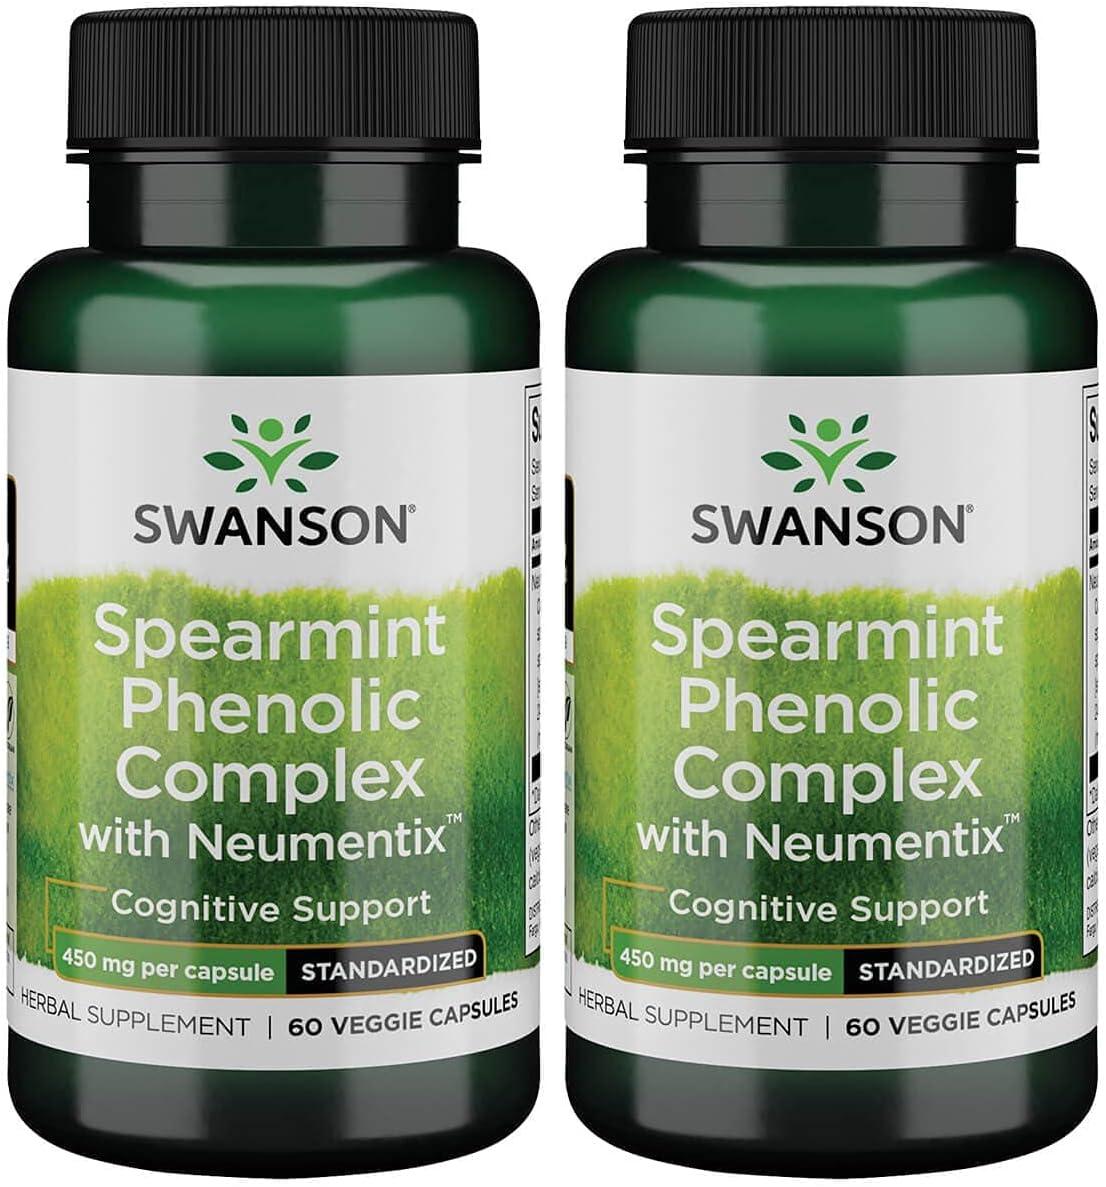 Swanson クリアランスsale!期間限定! Spearmint メーカー公式ショップ Phenolic Complex w Neumentix Milligrams 450 60